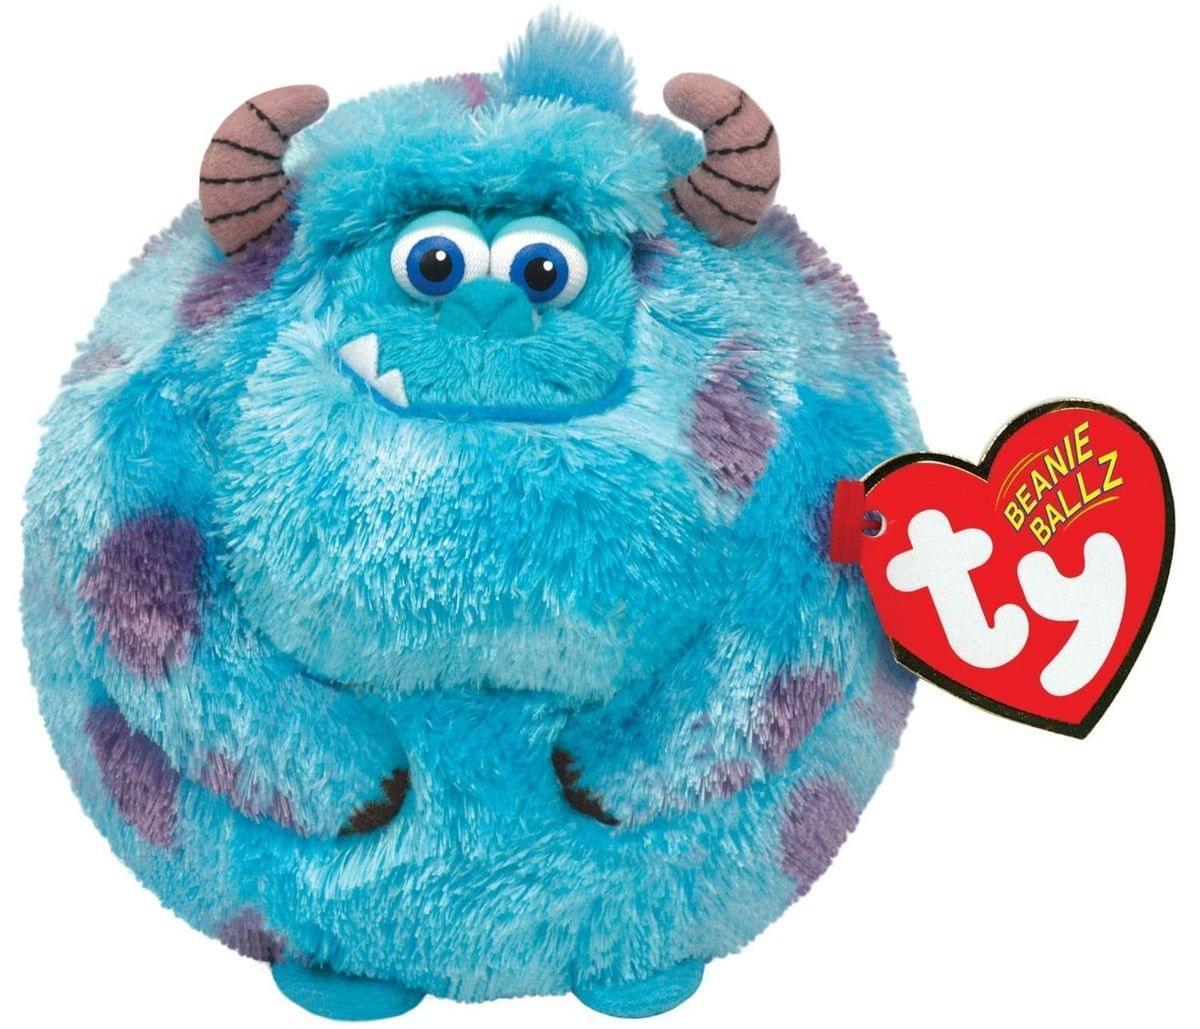 7453cb87c99 Monsters University Ty Beanie Ballz Plush  Sully 8421381289